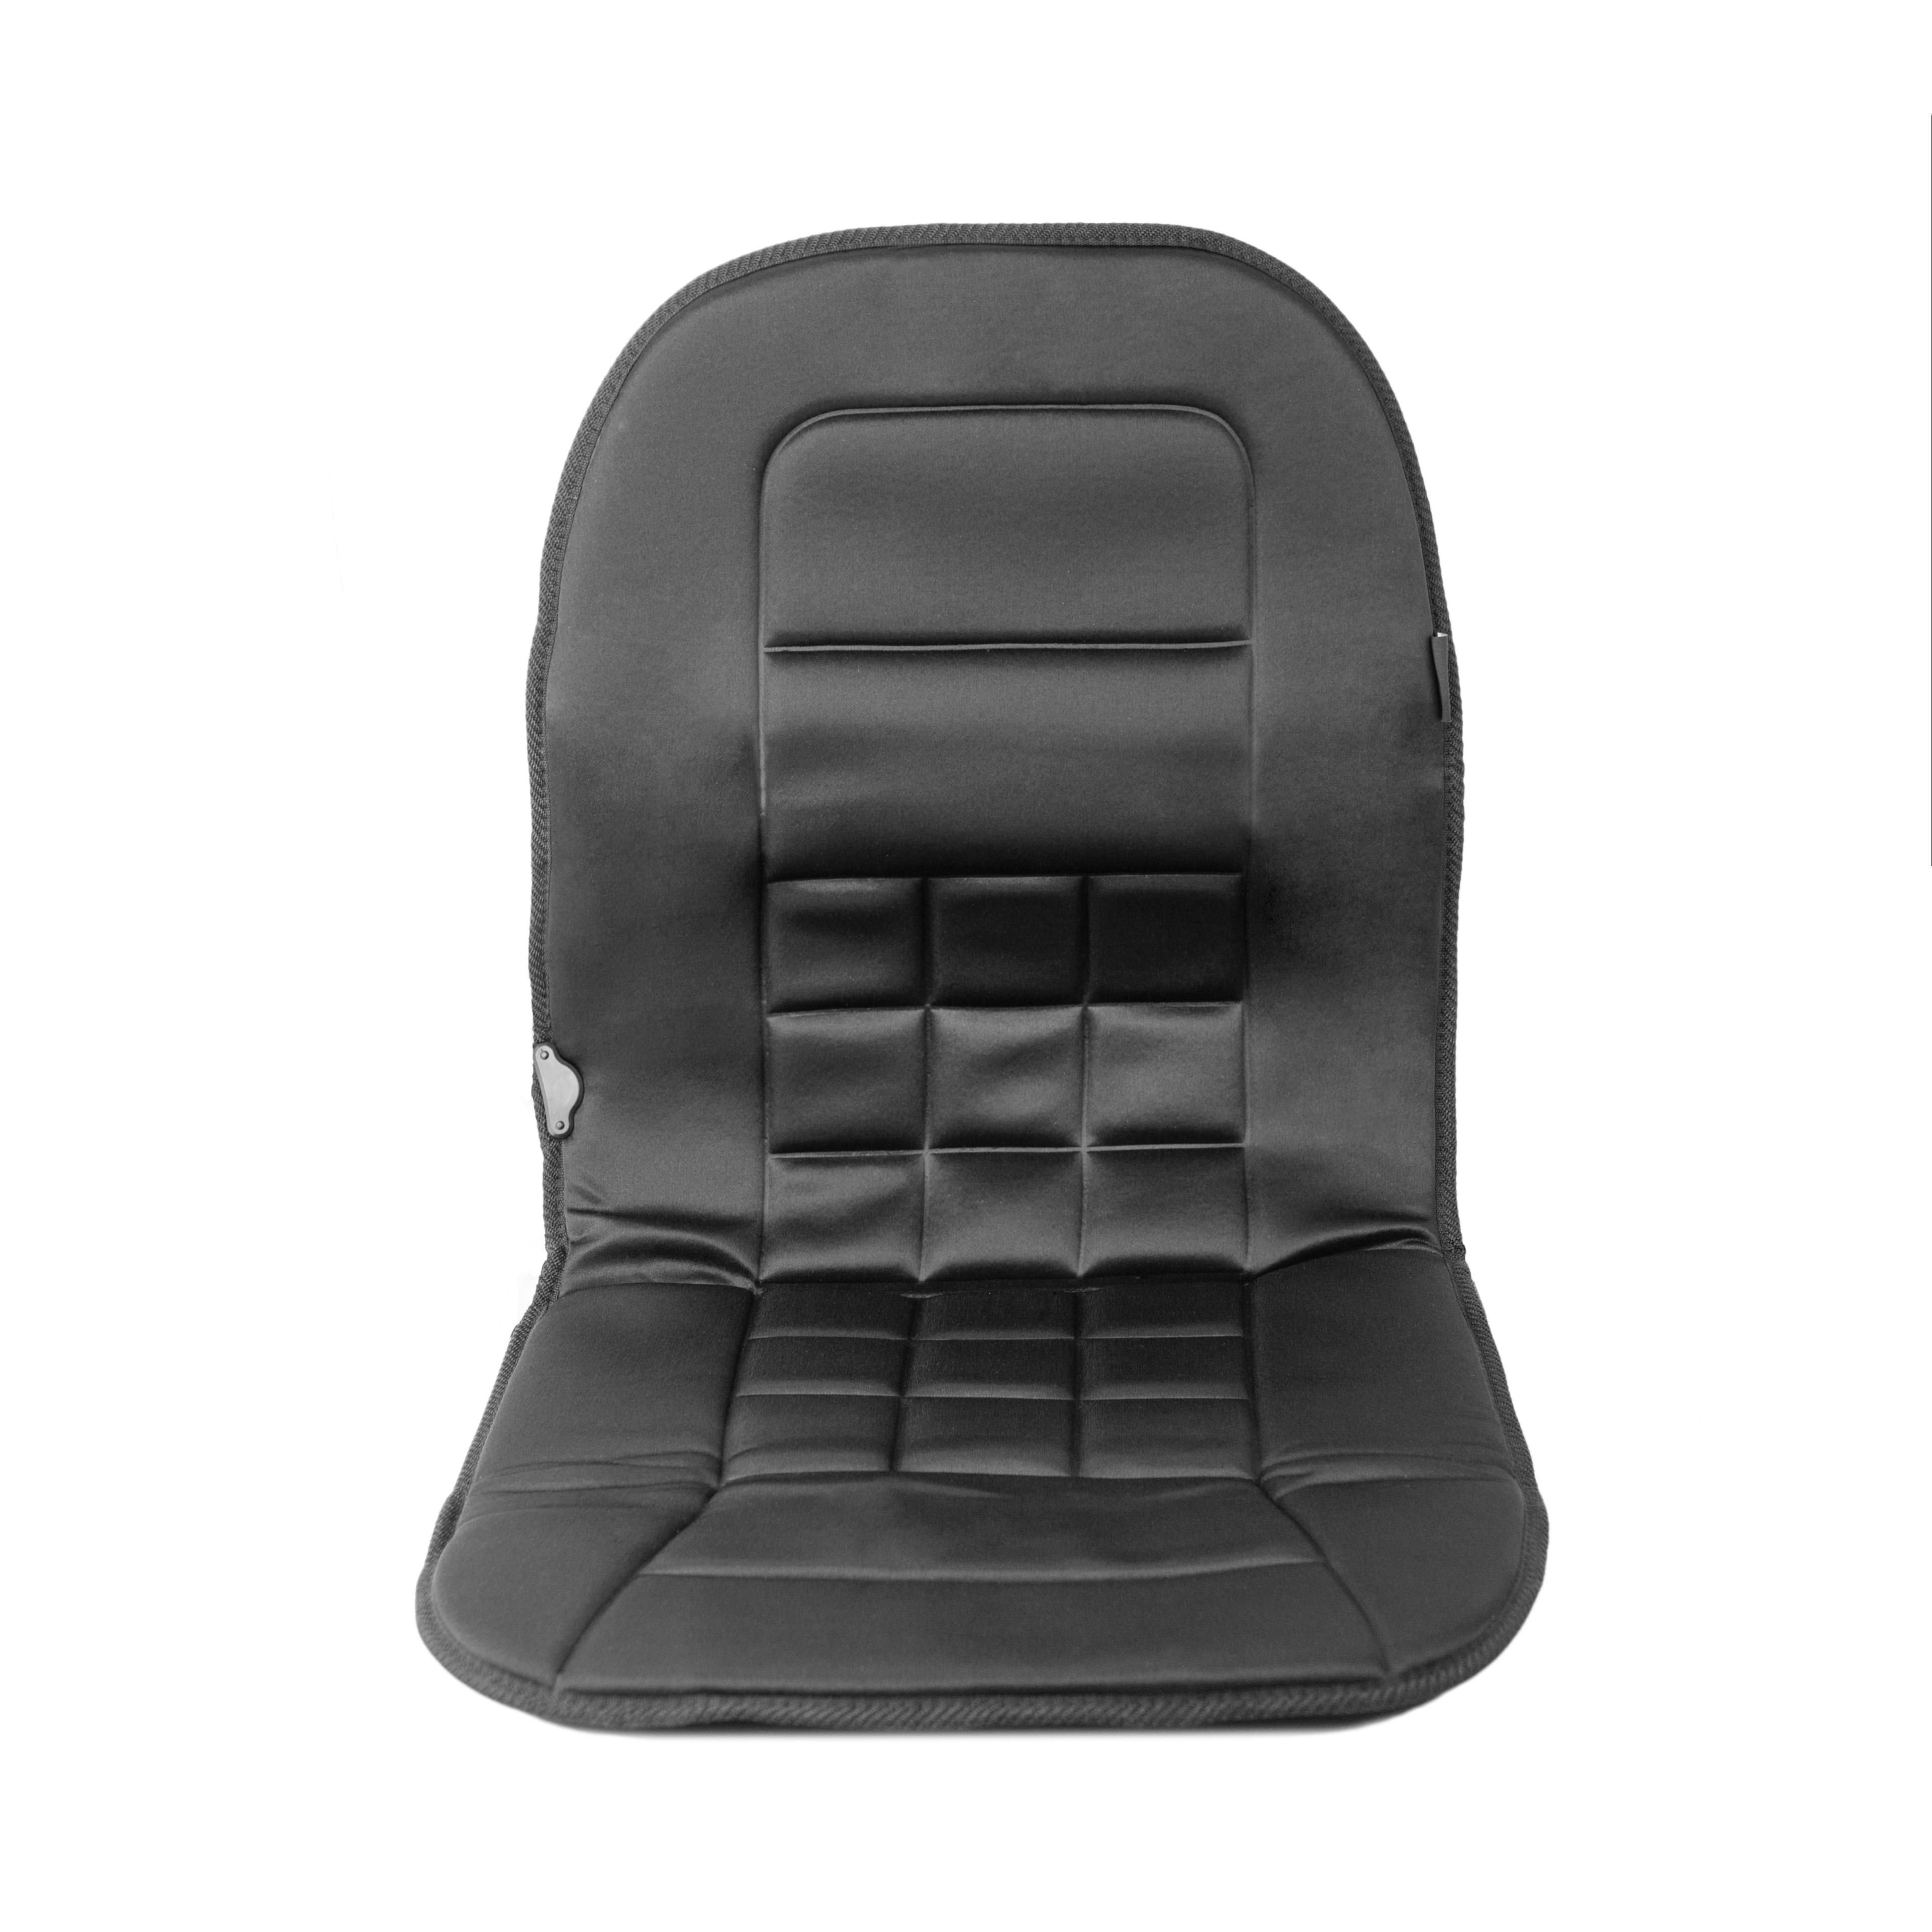 Heated Seat Cushion Heated Chair Pad Car Heated Cushion Heated